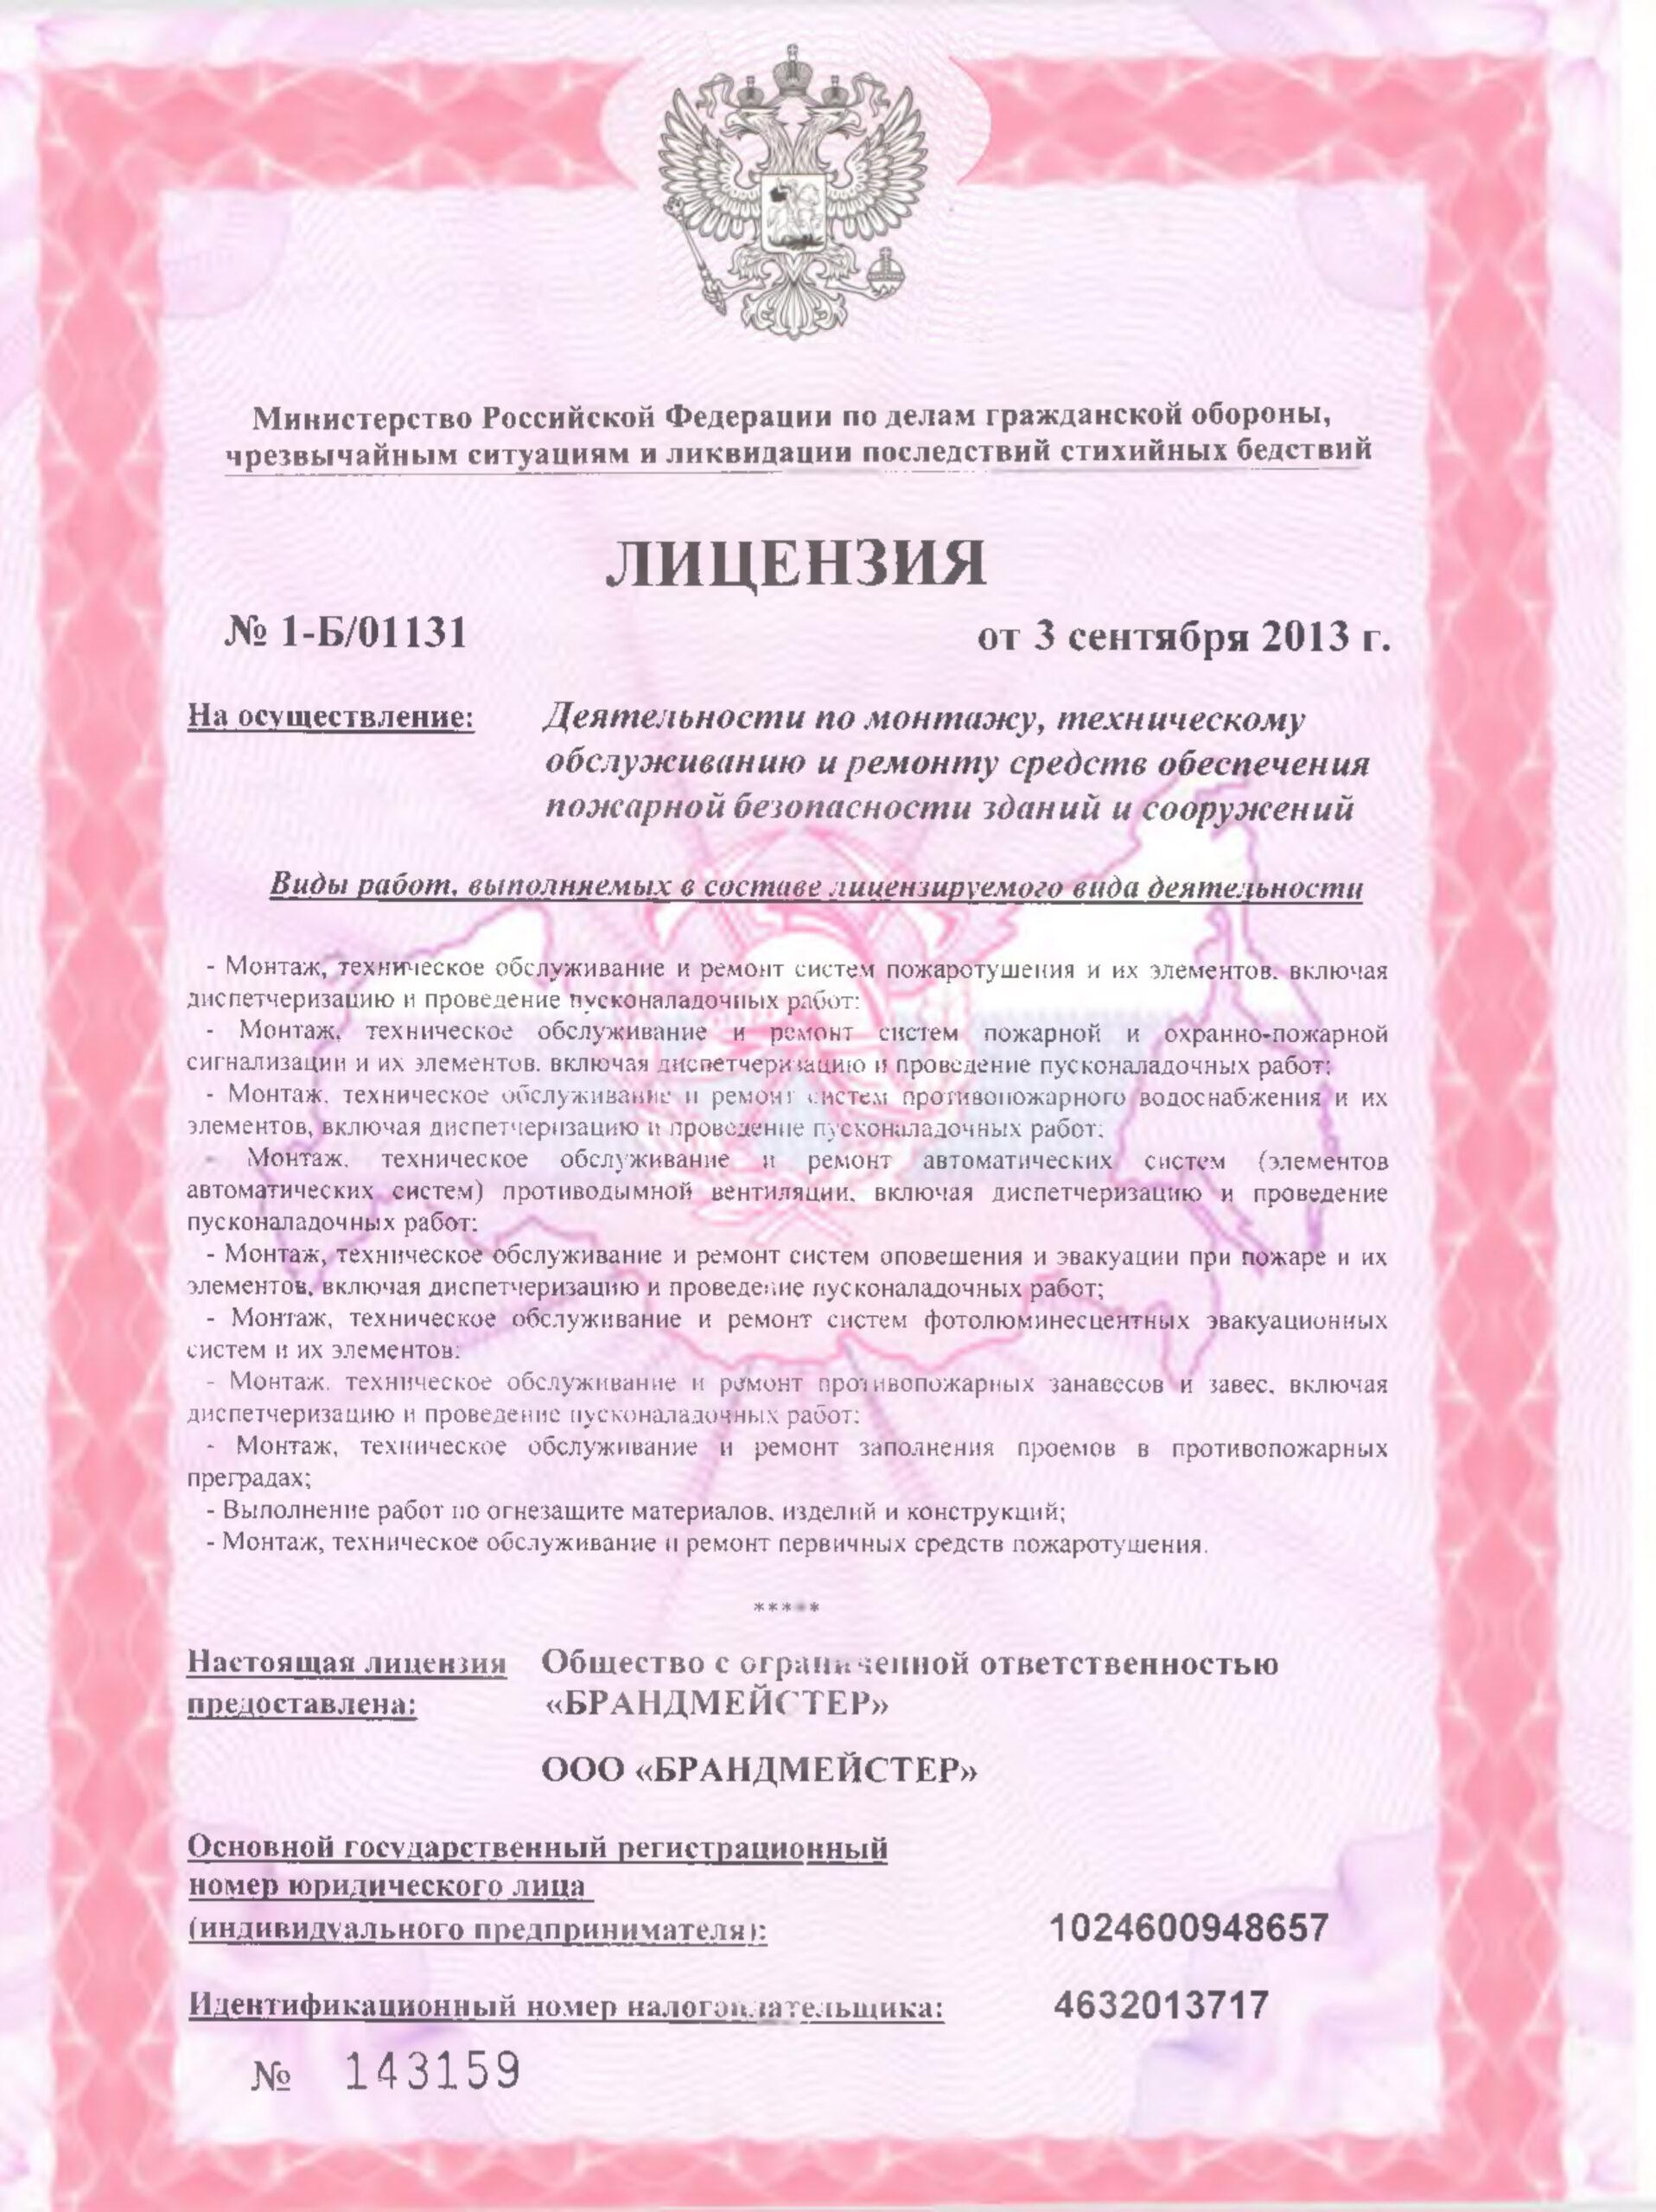 Лицензия МЧС Брандмейстер-1